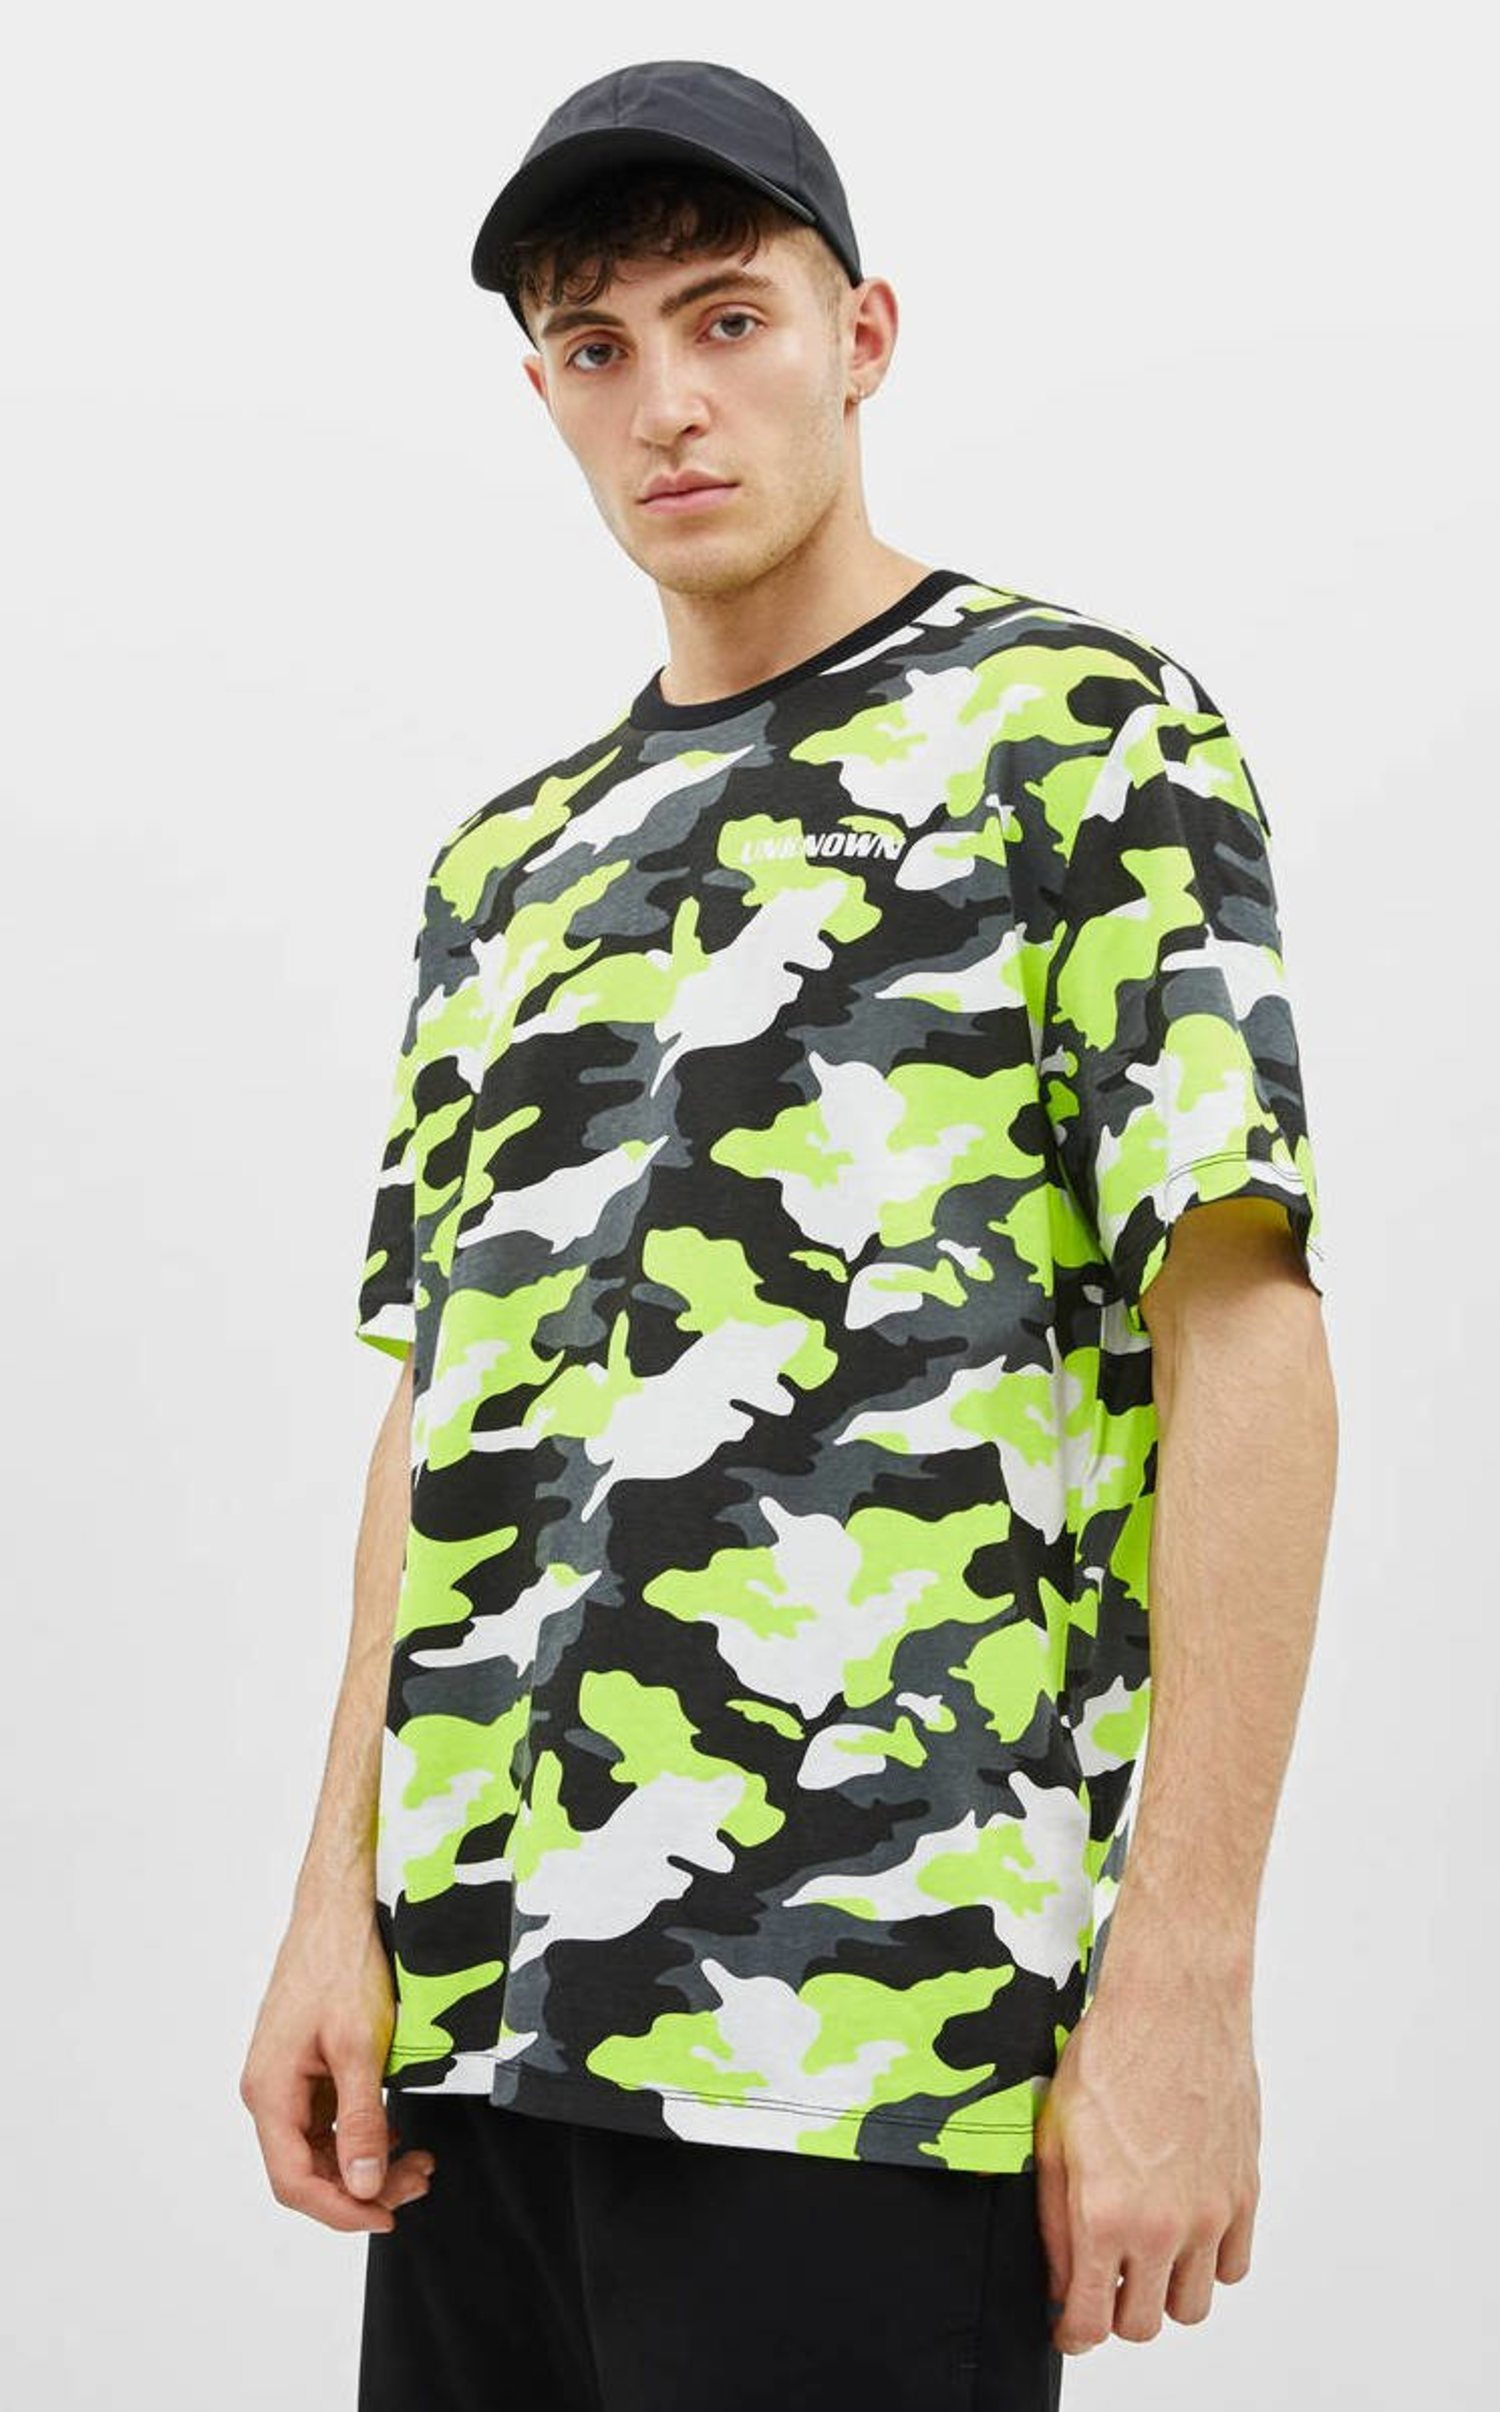 Camiseta con estampado fosforito de camuflaje de Bershka.